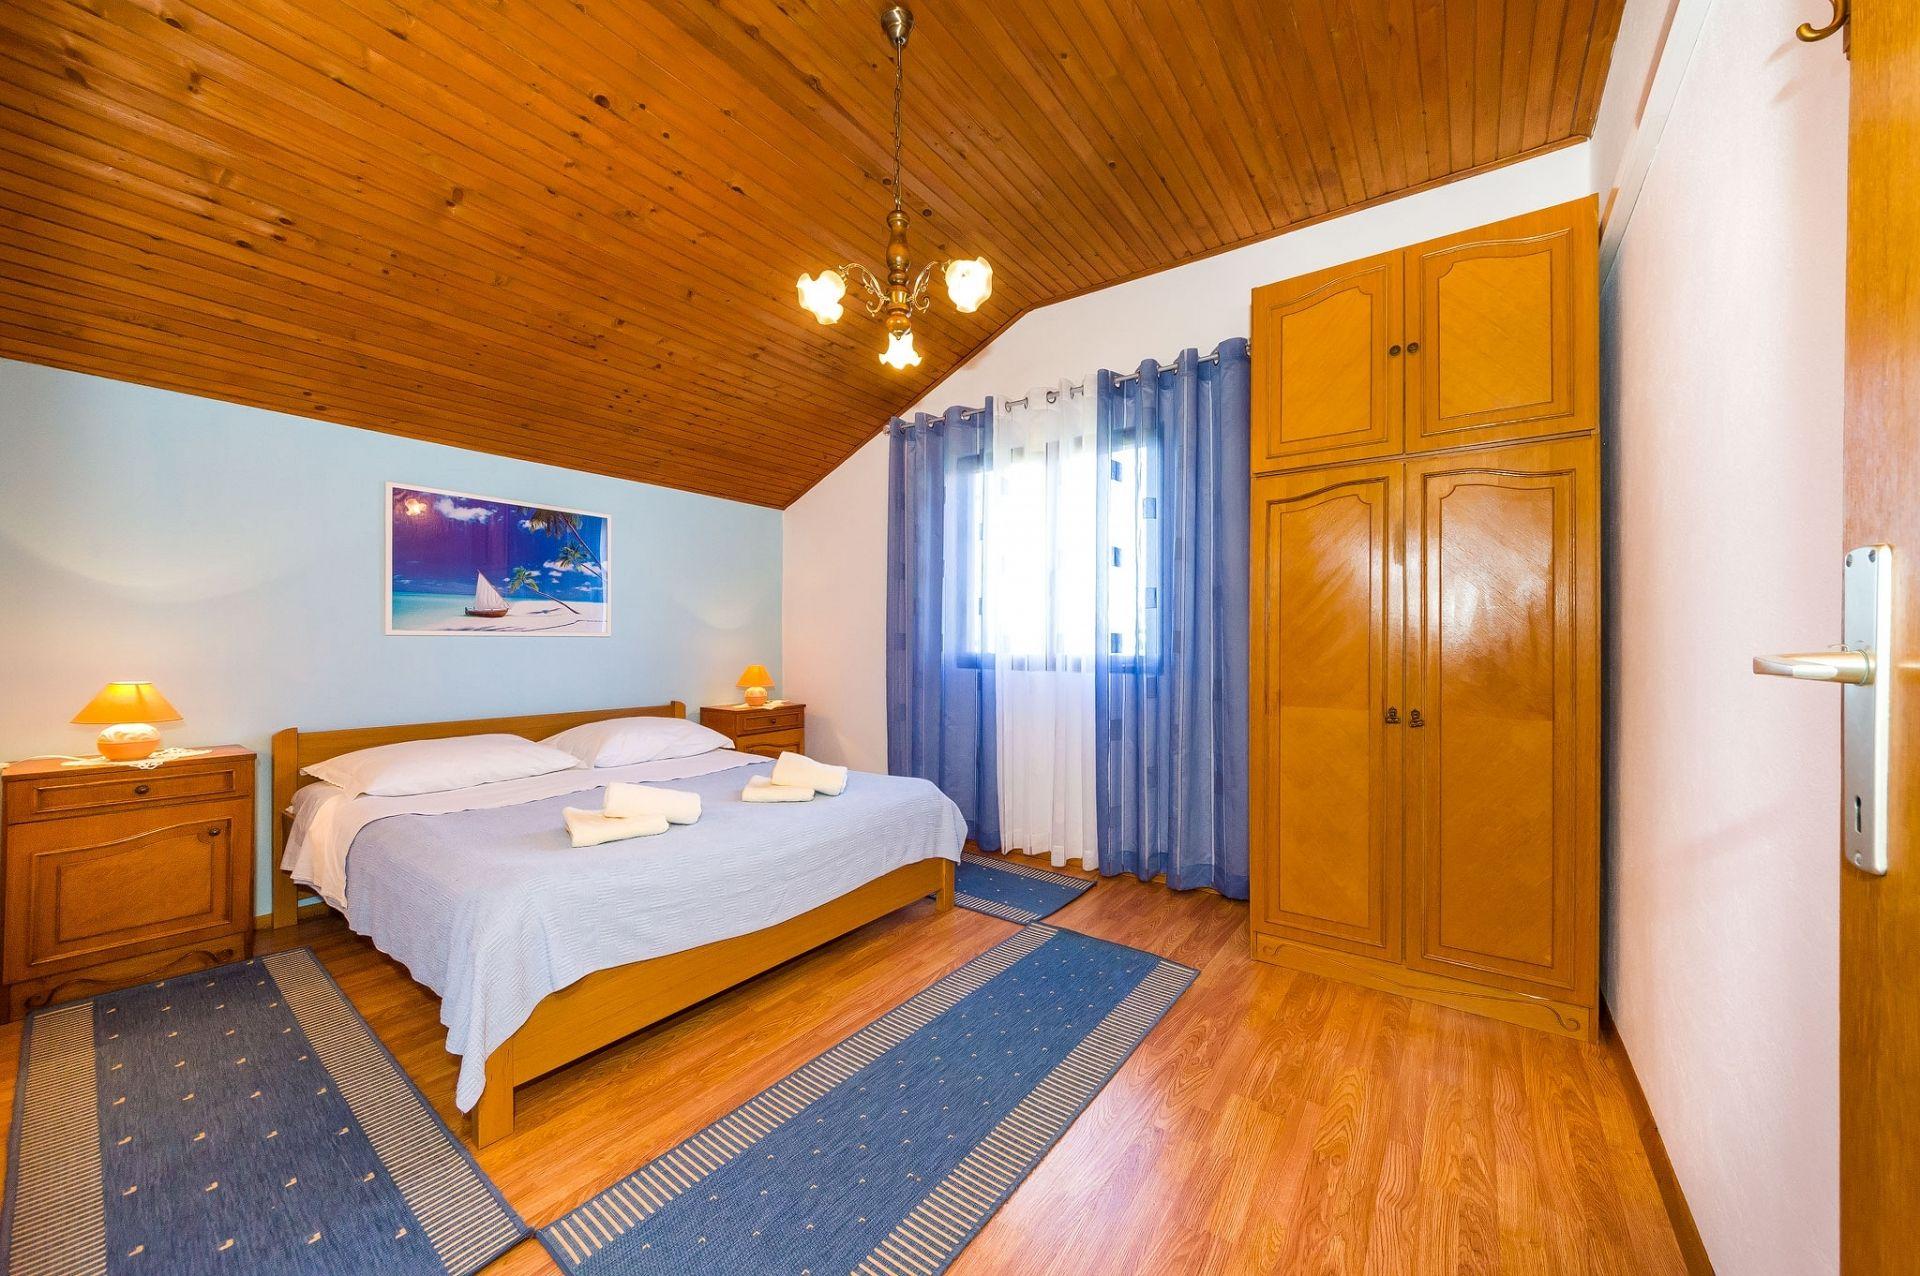 Apartmani Apartment Matkos A1 Nin, Zadar riviera 50657, Nin, , Zadarska županija